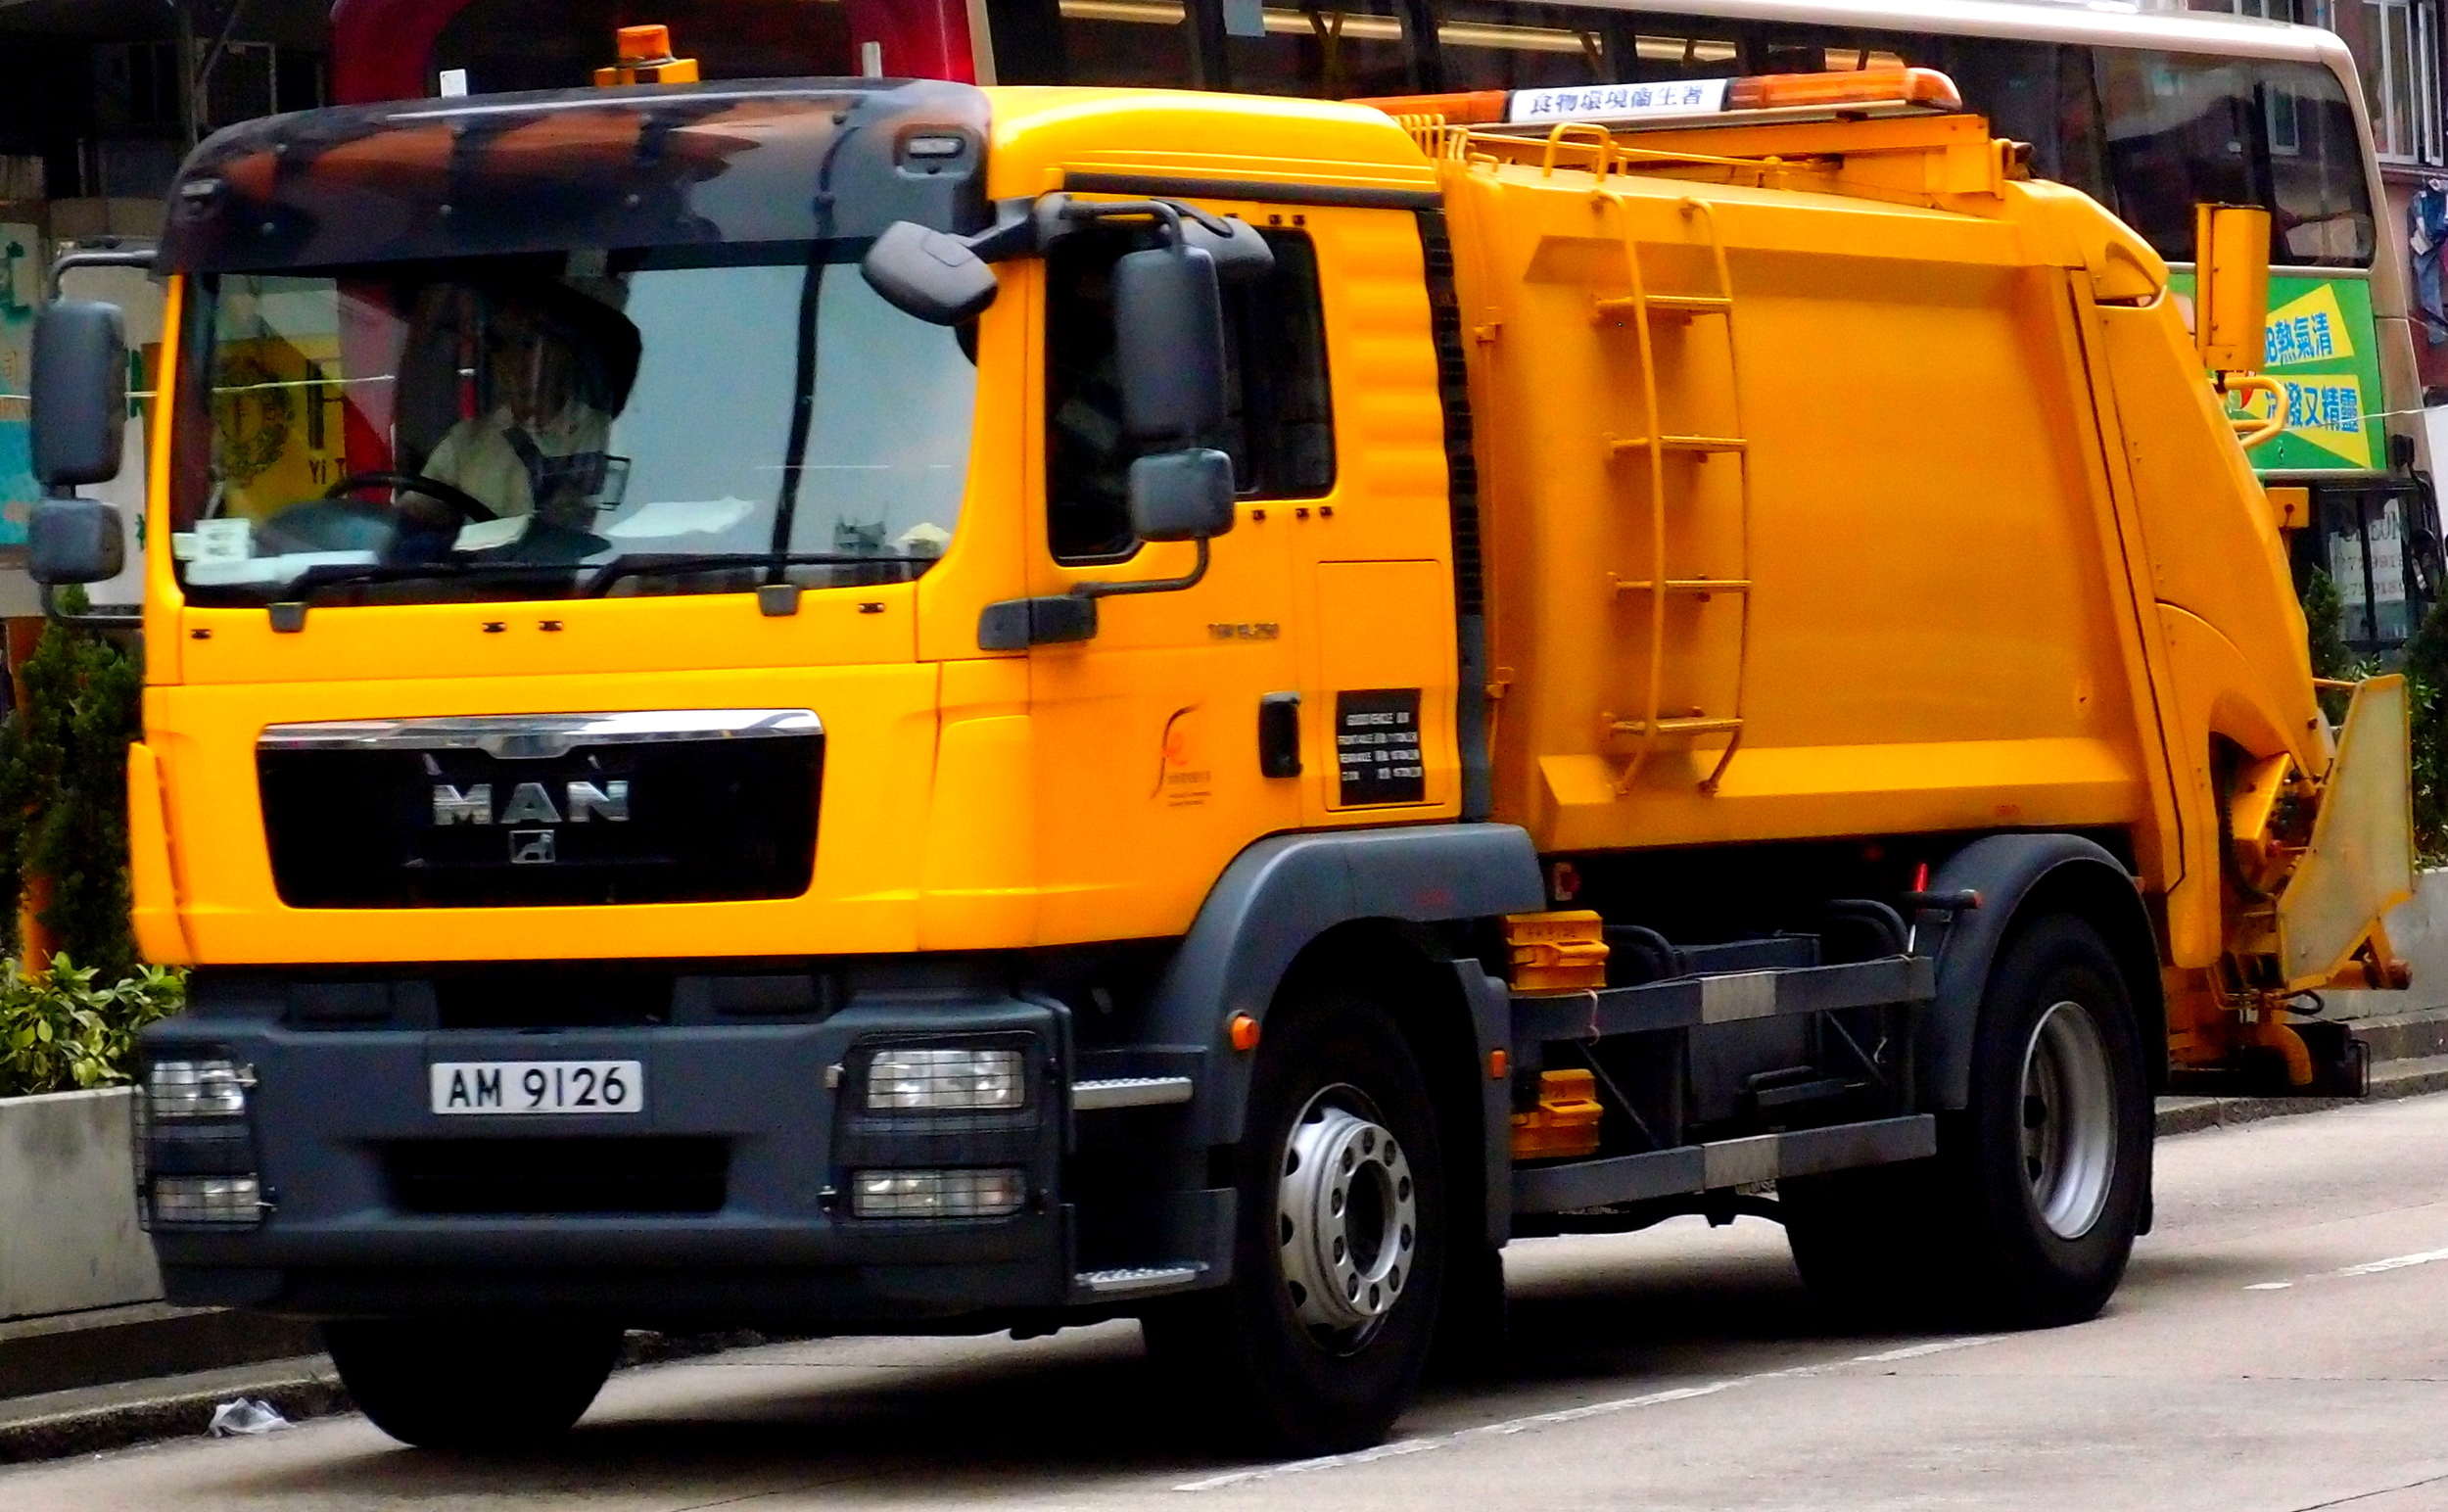 A waste disposal truck